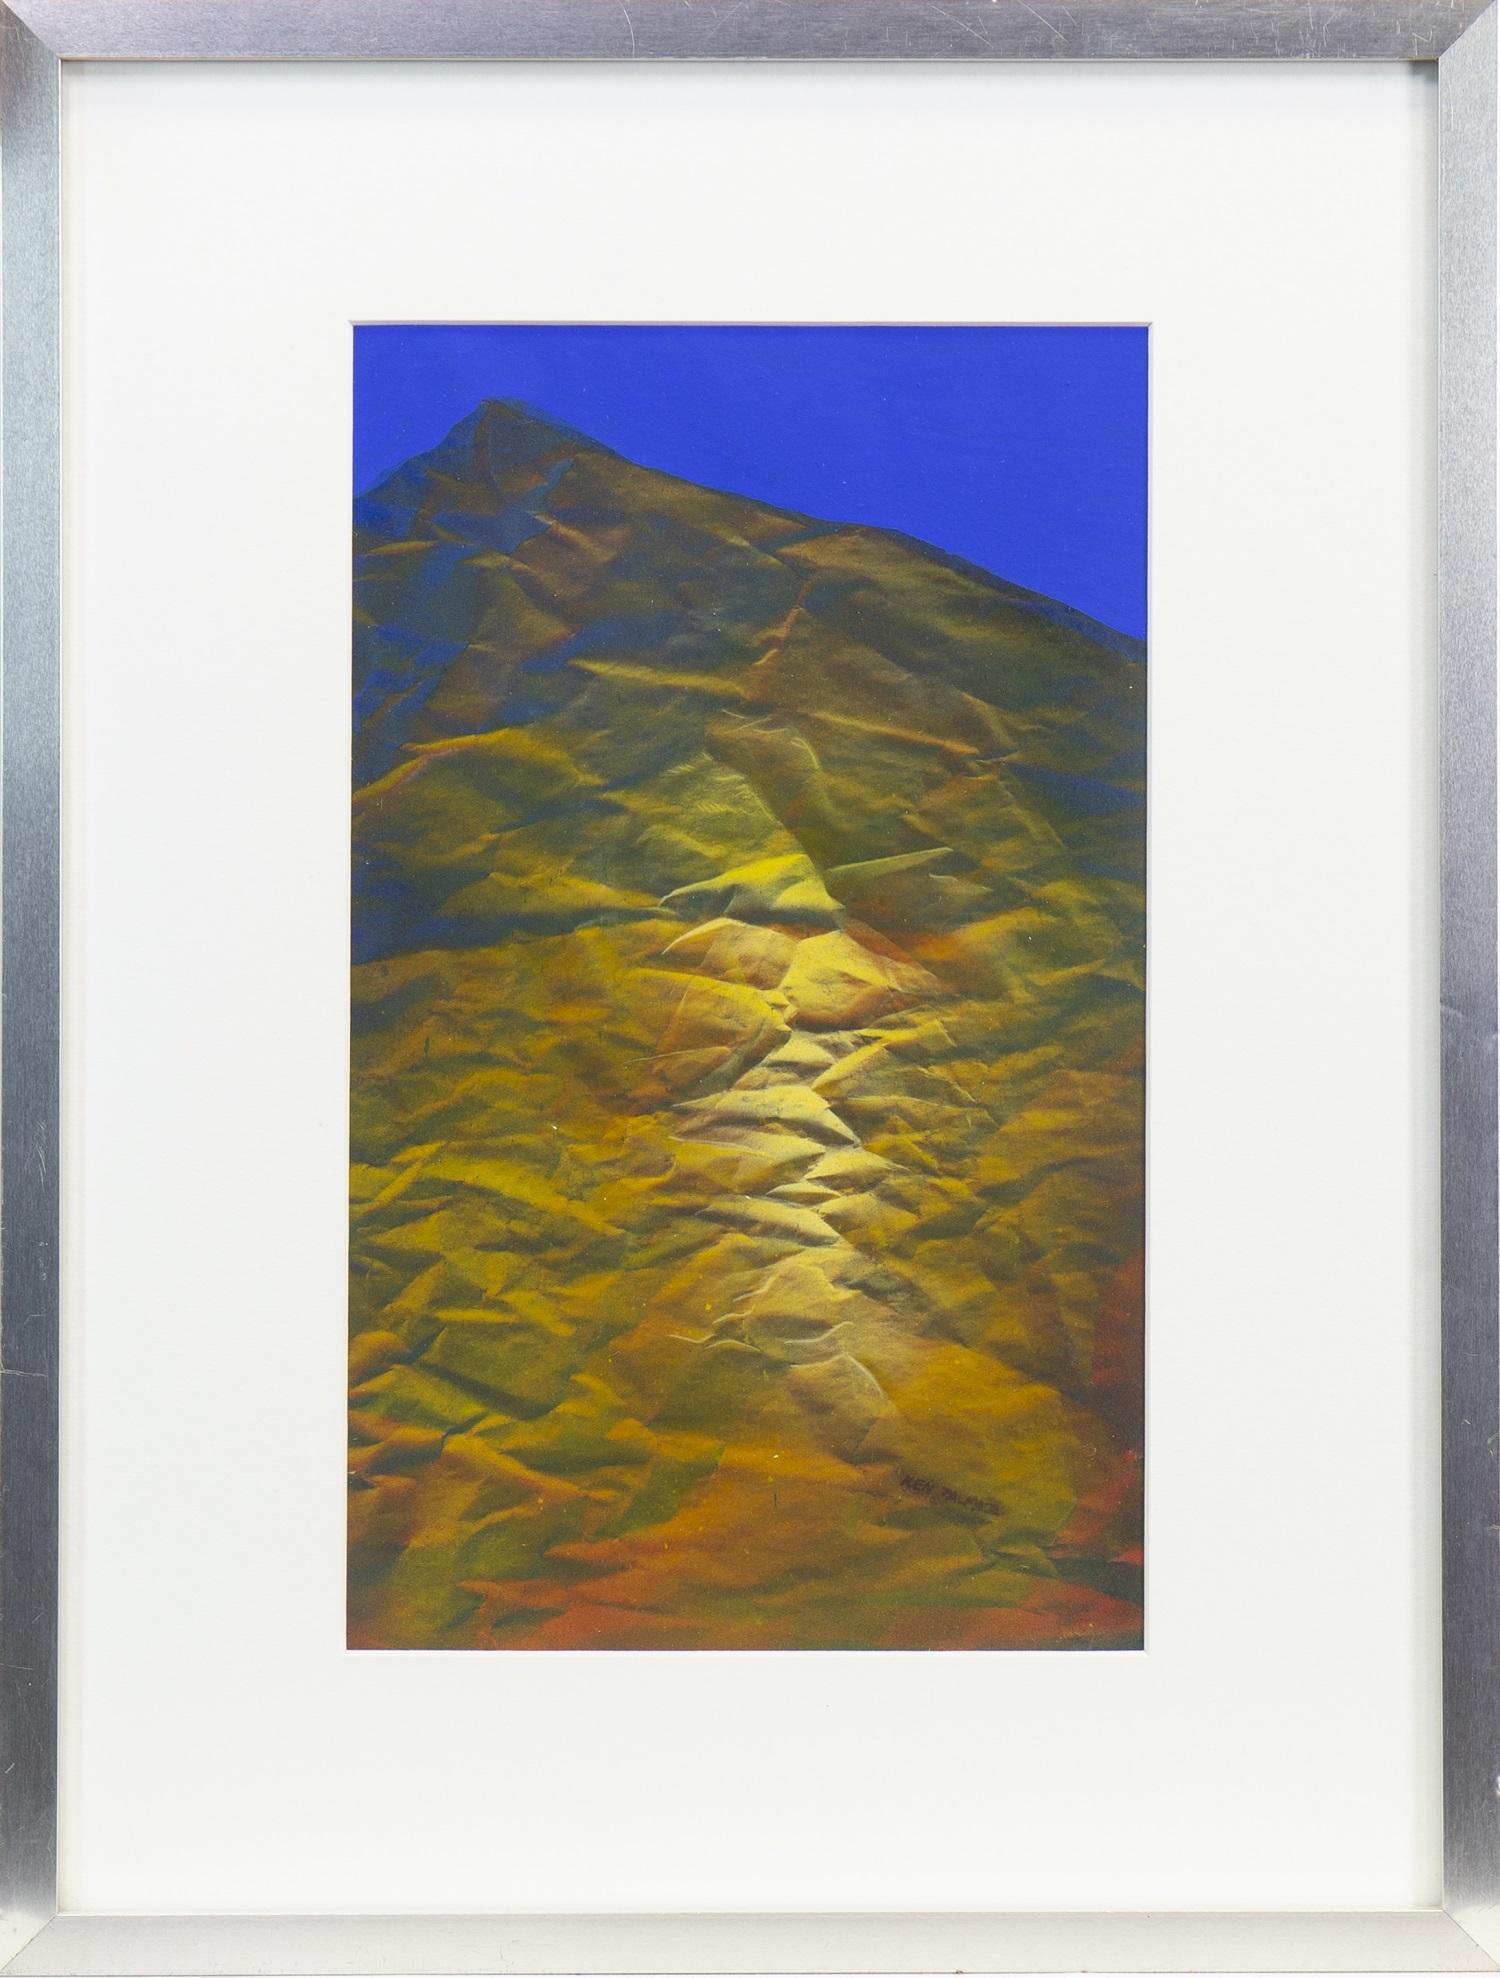 Lot 667 - BLUE, A MIXED MEDIA BY KEN PALMER